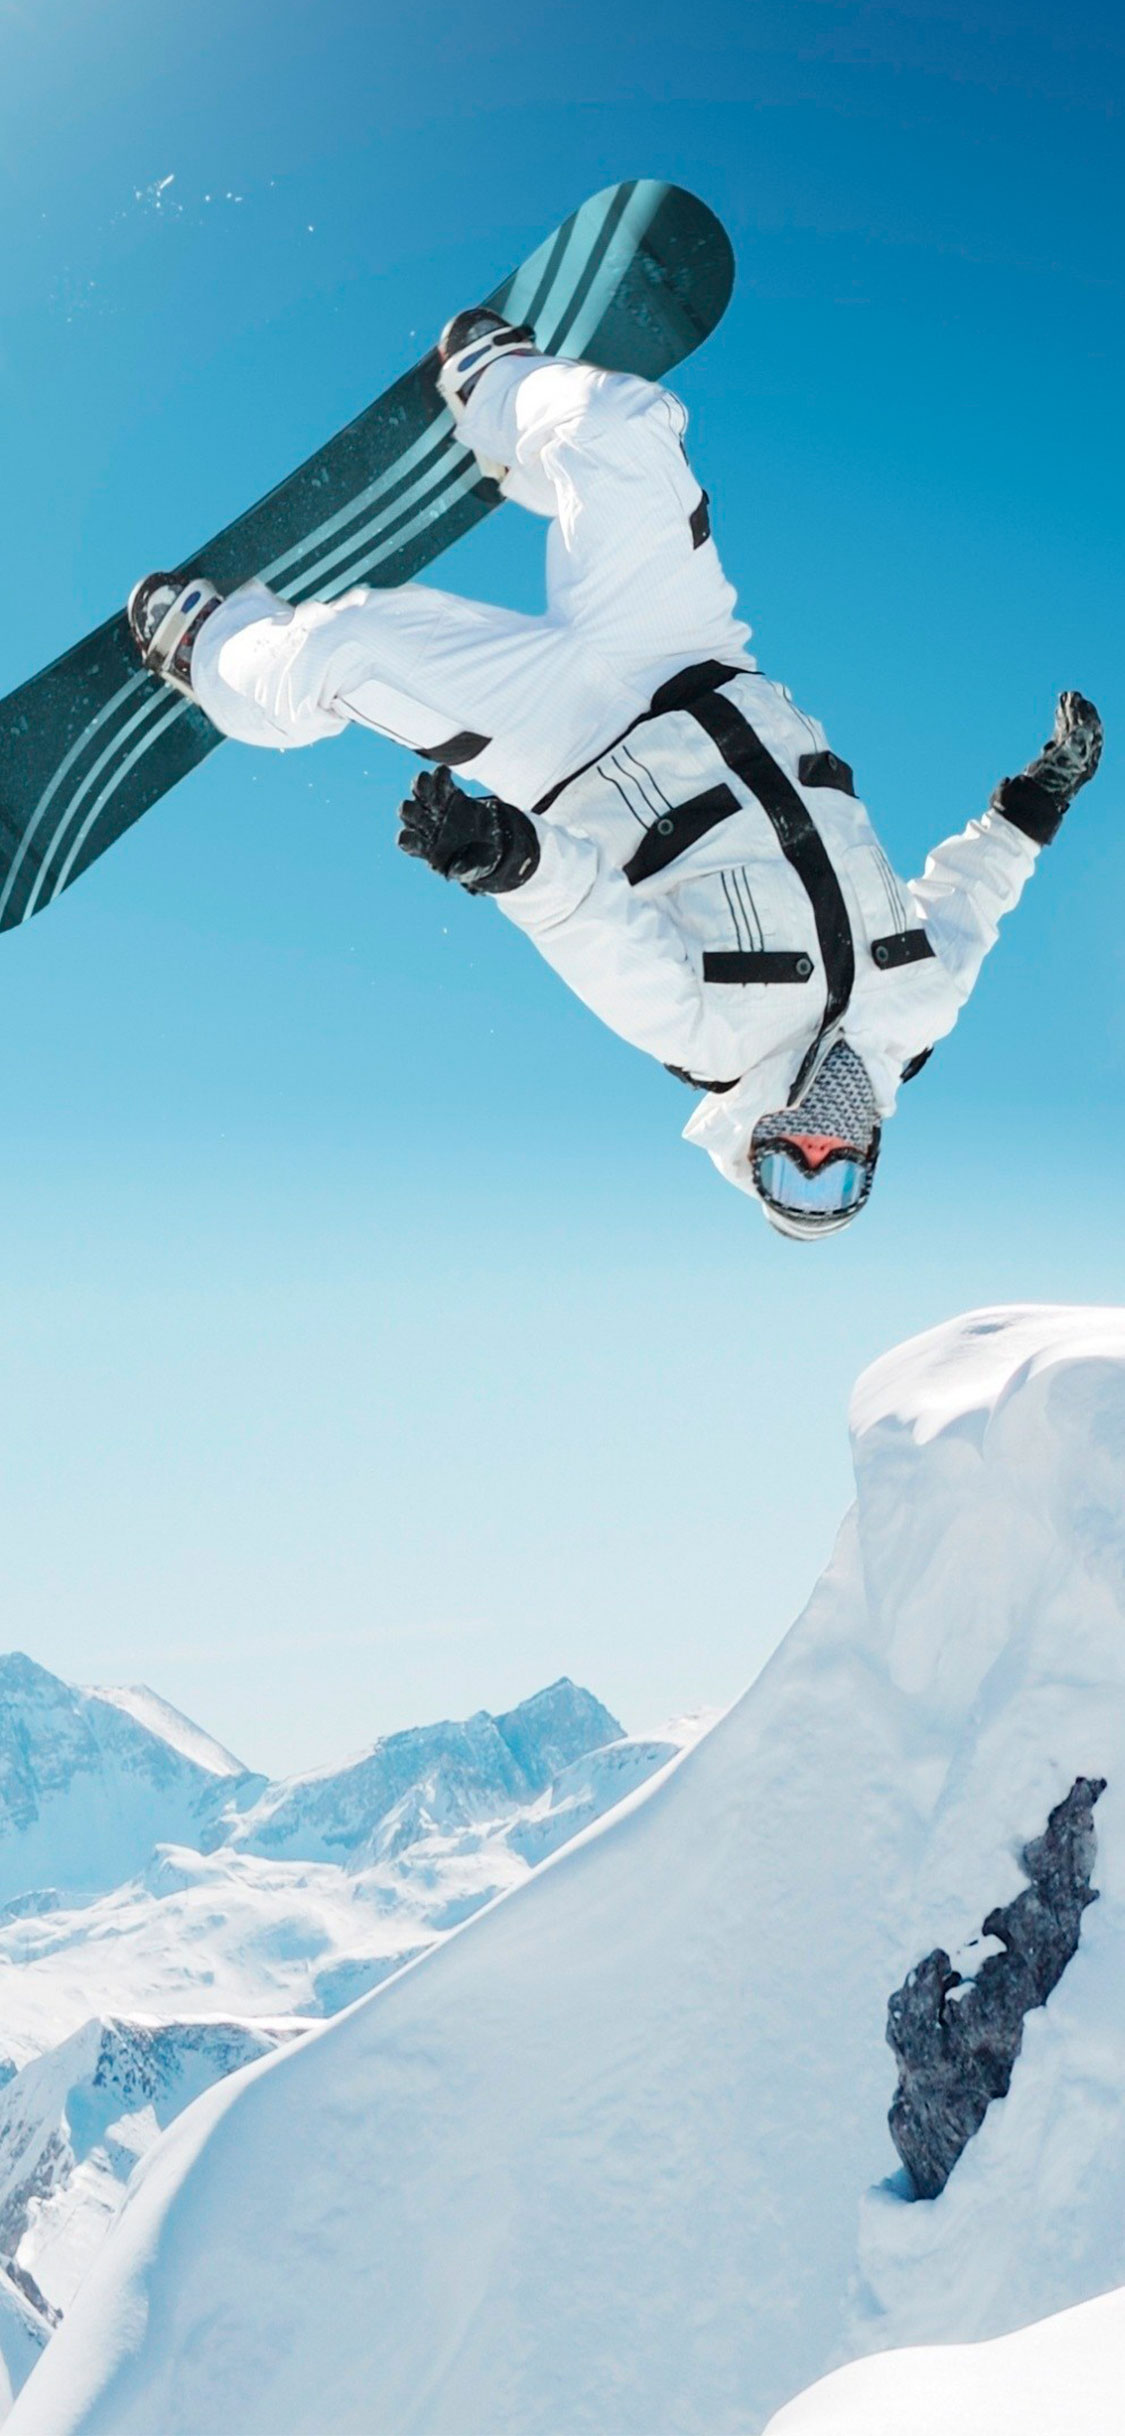 iPhone wallpaper snowboard3 Fonds d'écran iPhone du 14/06/2018